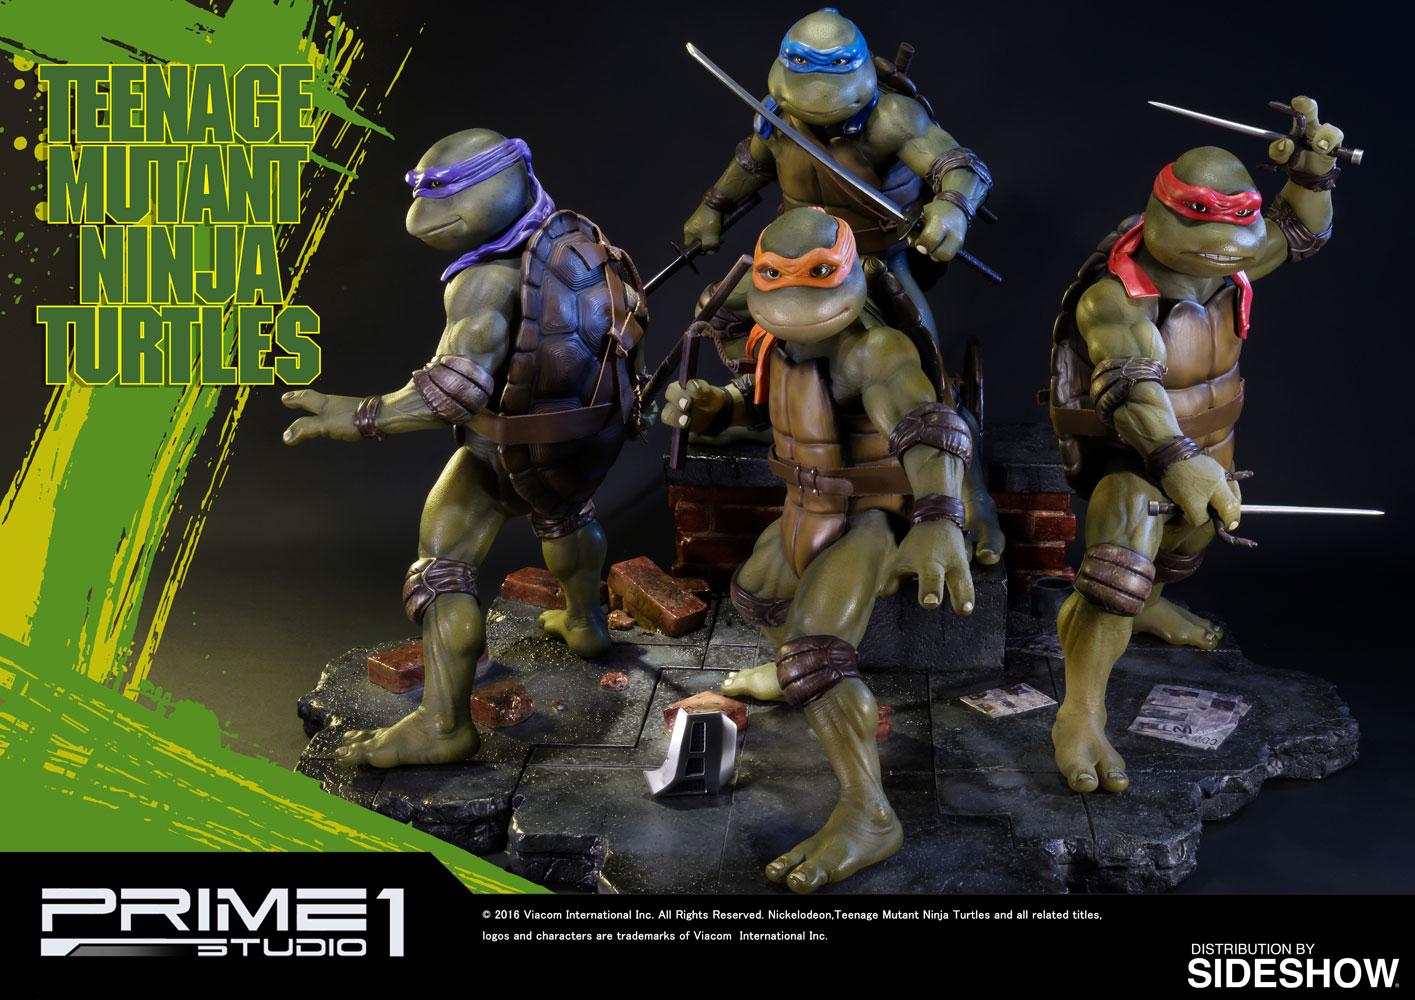 High Resolution Wallpaper   Teenage Mutant Ninja Turtles (1990) 1415x1000 px